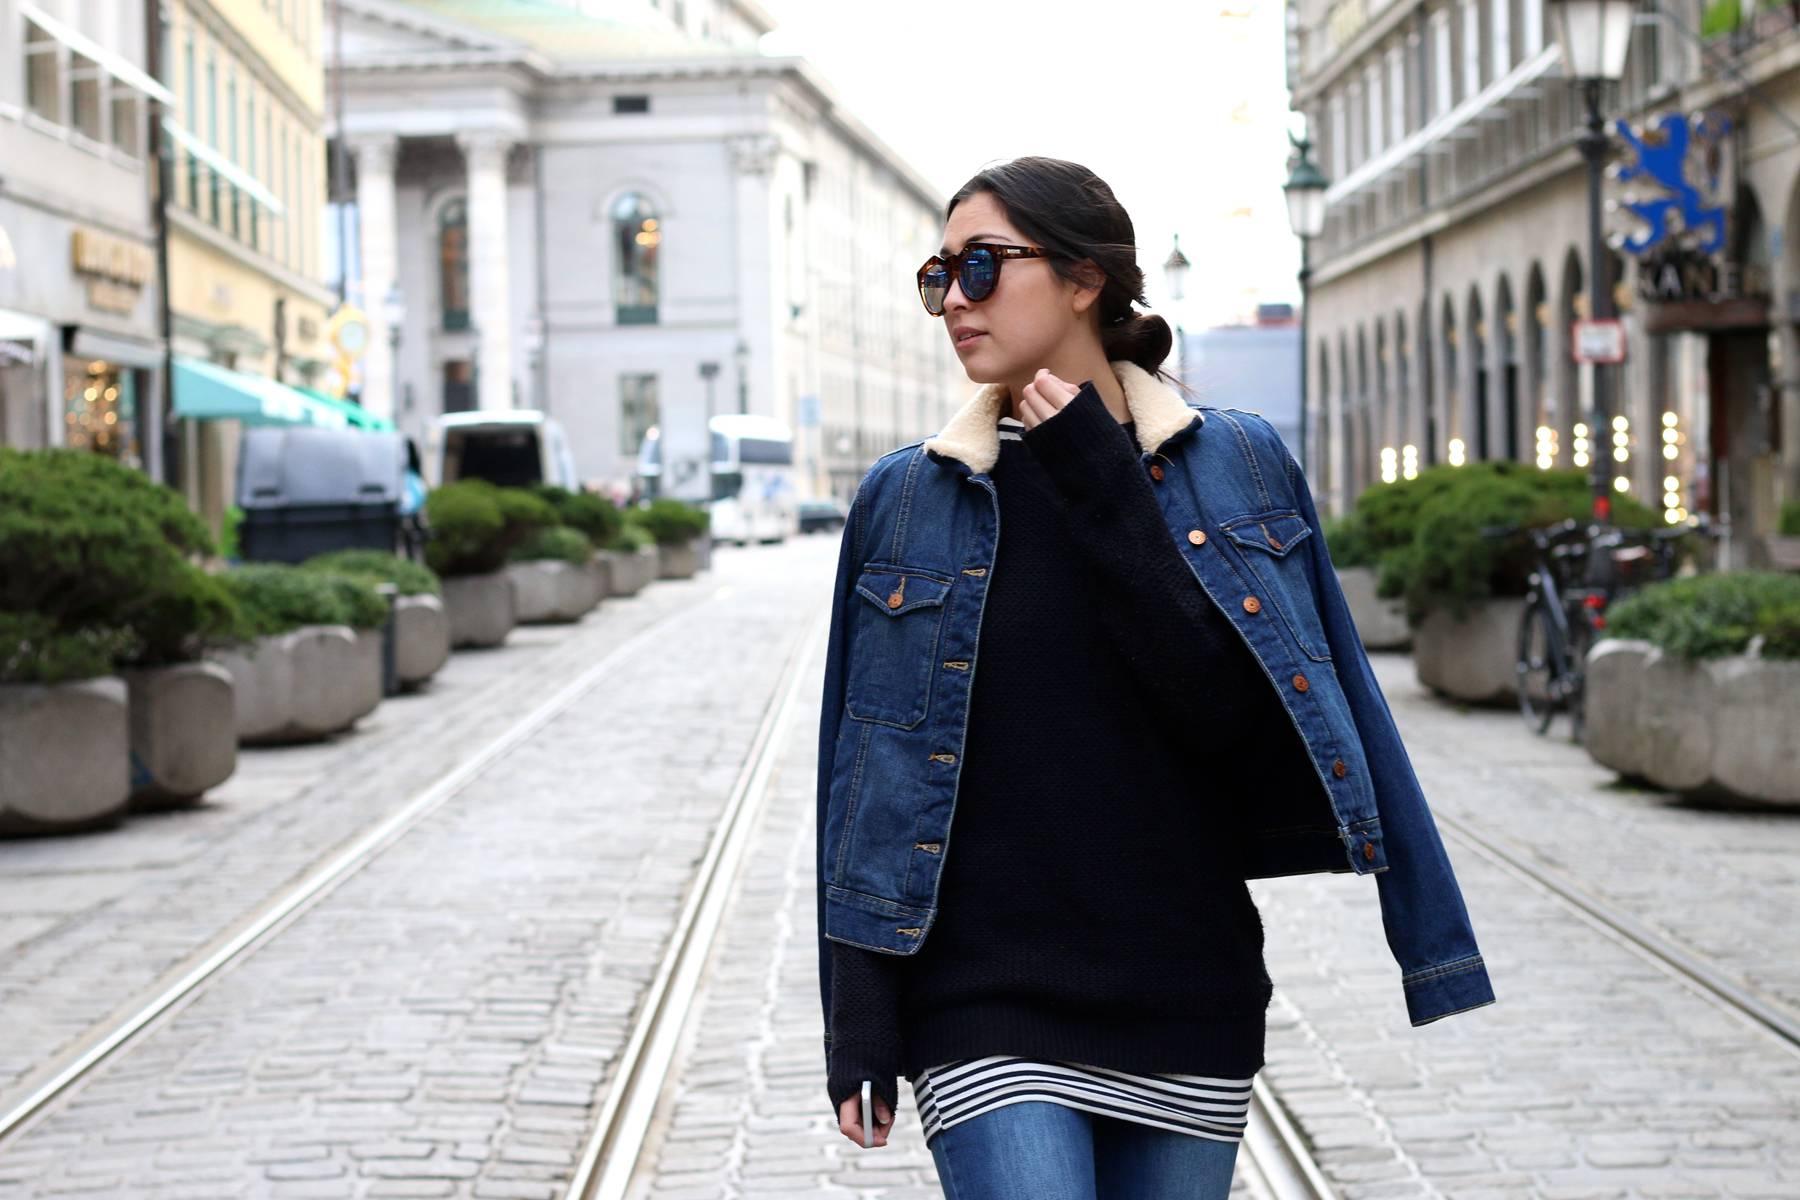 streetstyle - munich - inspiration - german fashionblog - fashionista - style - flared pants - schlaghose - denim trend - denim jacket - buffalo heels - le specs sunnies - ootd - lookbook - marienplatz